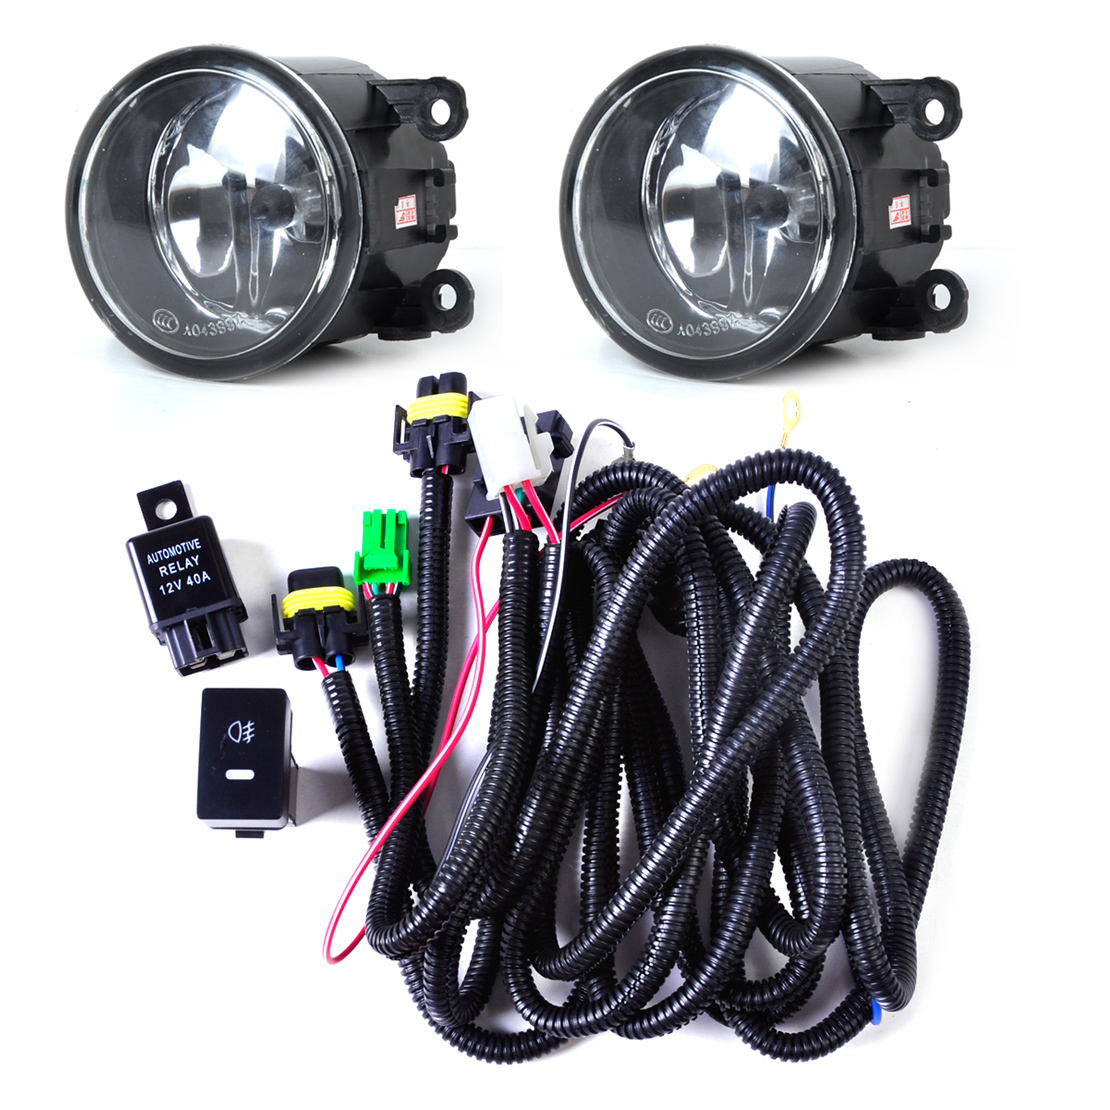 small resolution of dwcx black wiring harness sockets switch 2 fog lights h11 lamp 12v 55w kit